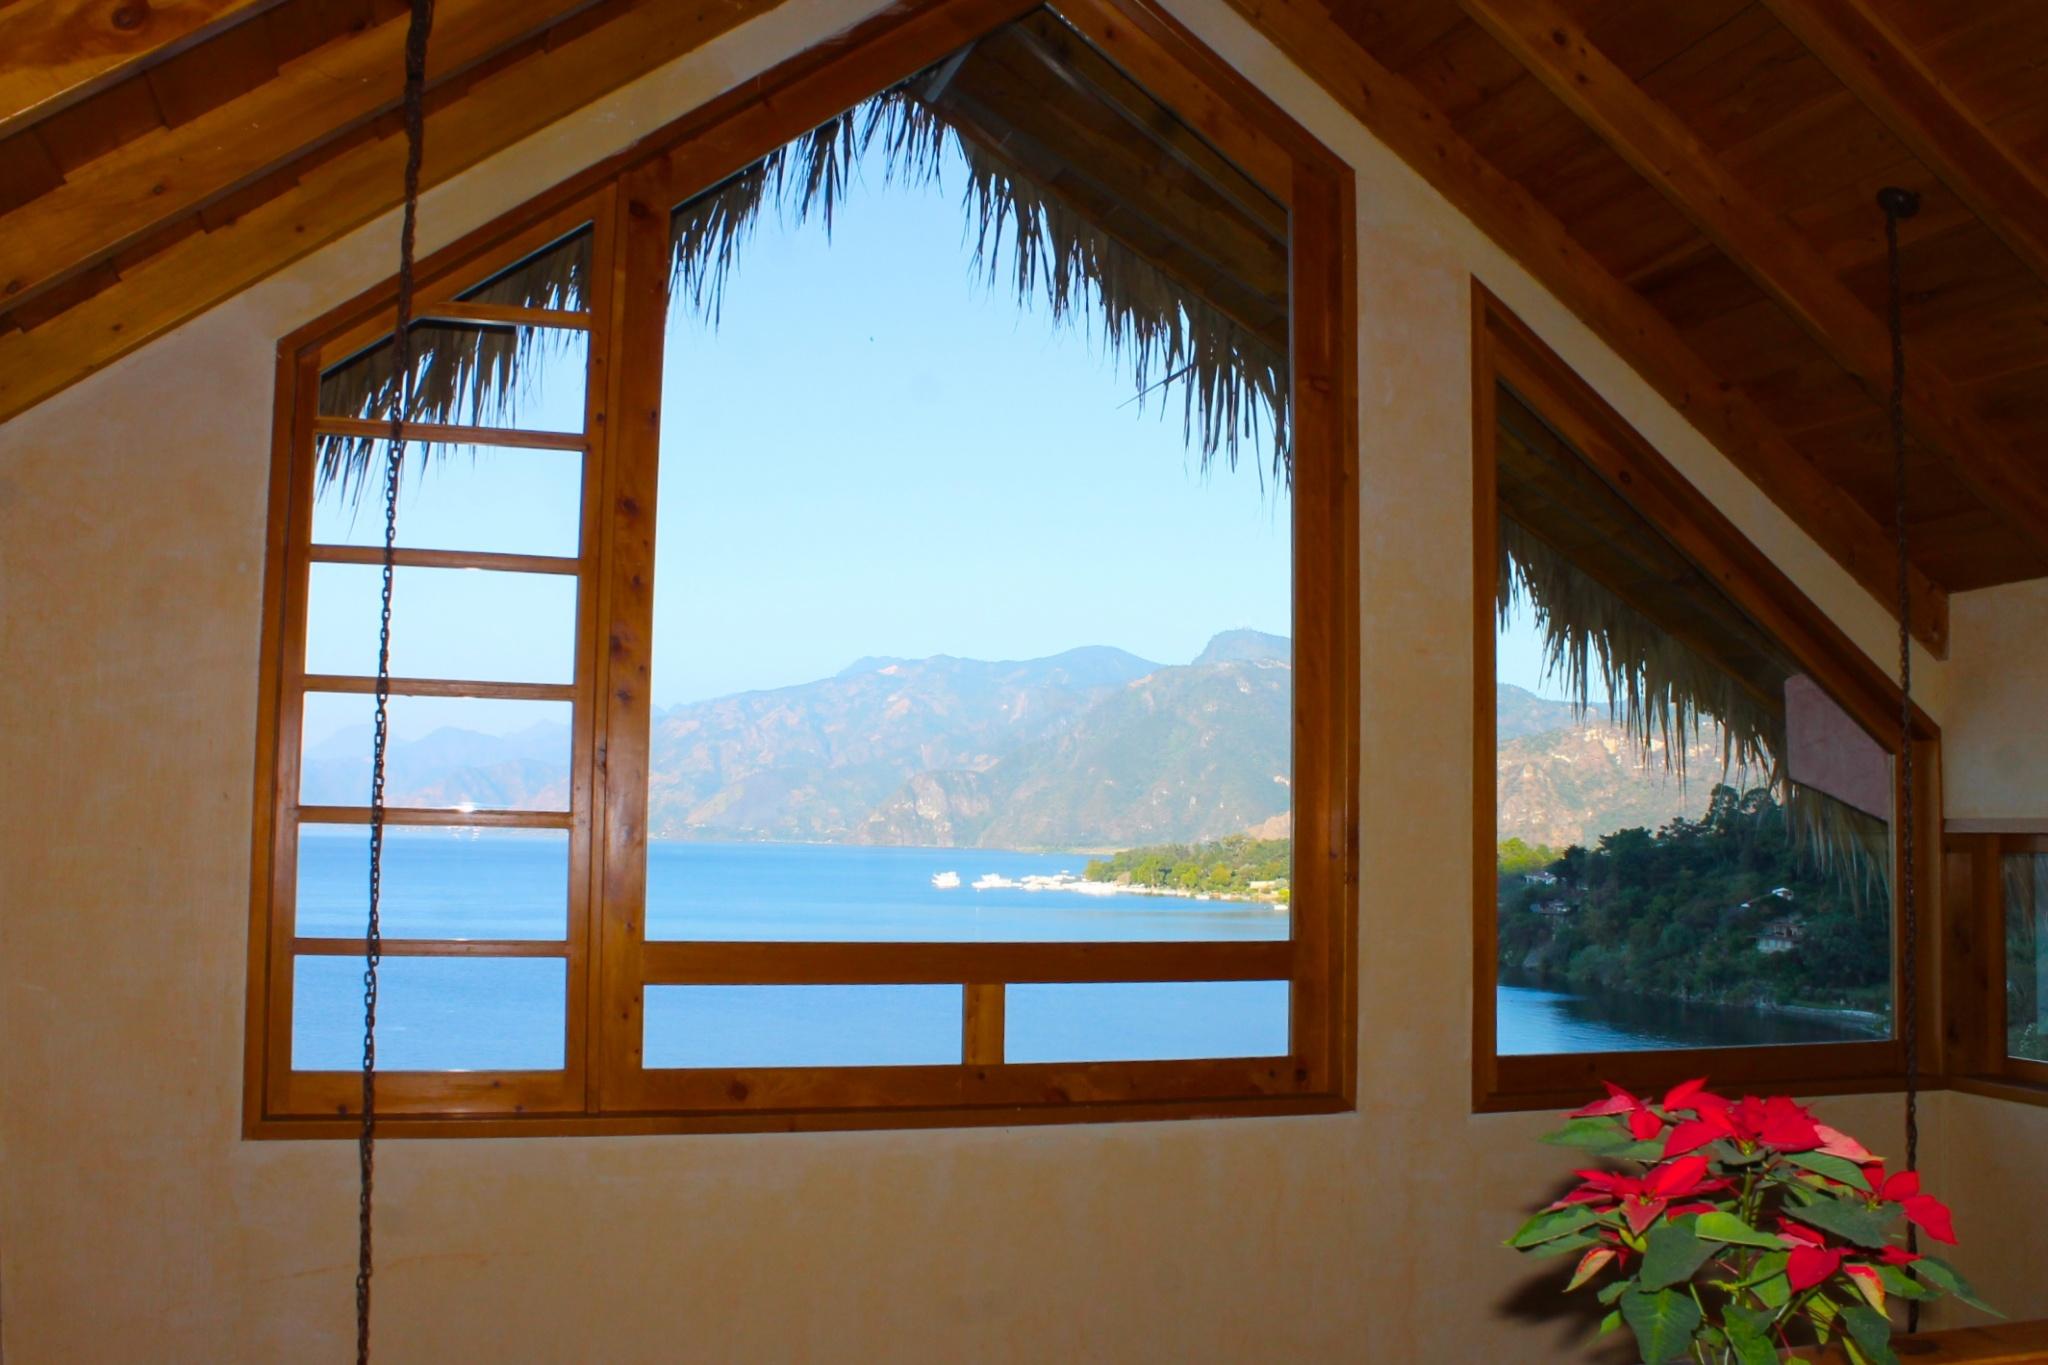 View from second story mezzanine, Villas B'alam Ya, Atitlan, Guatemala